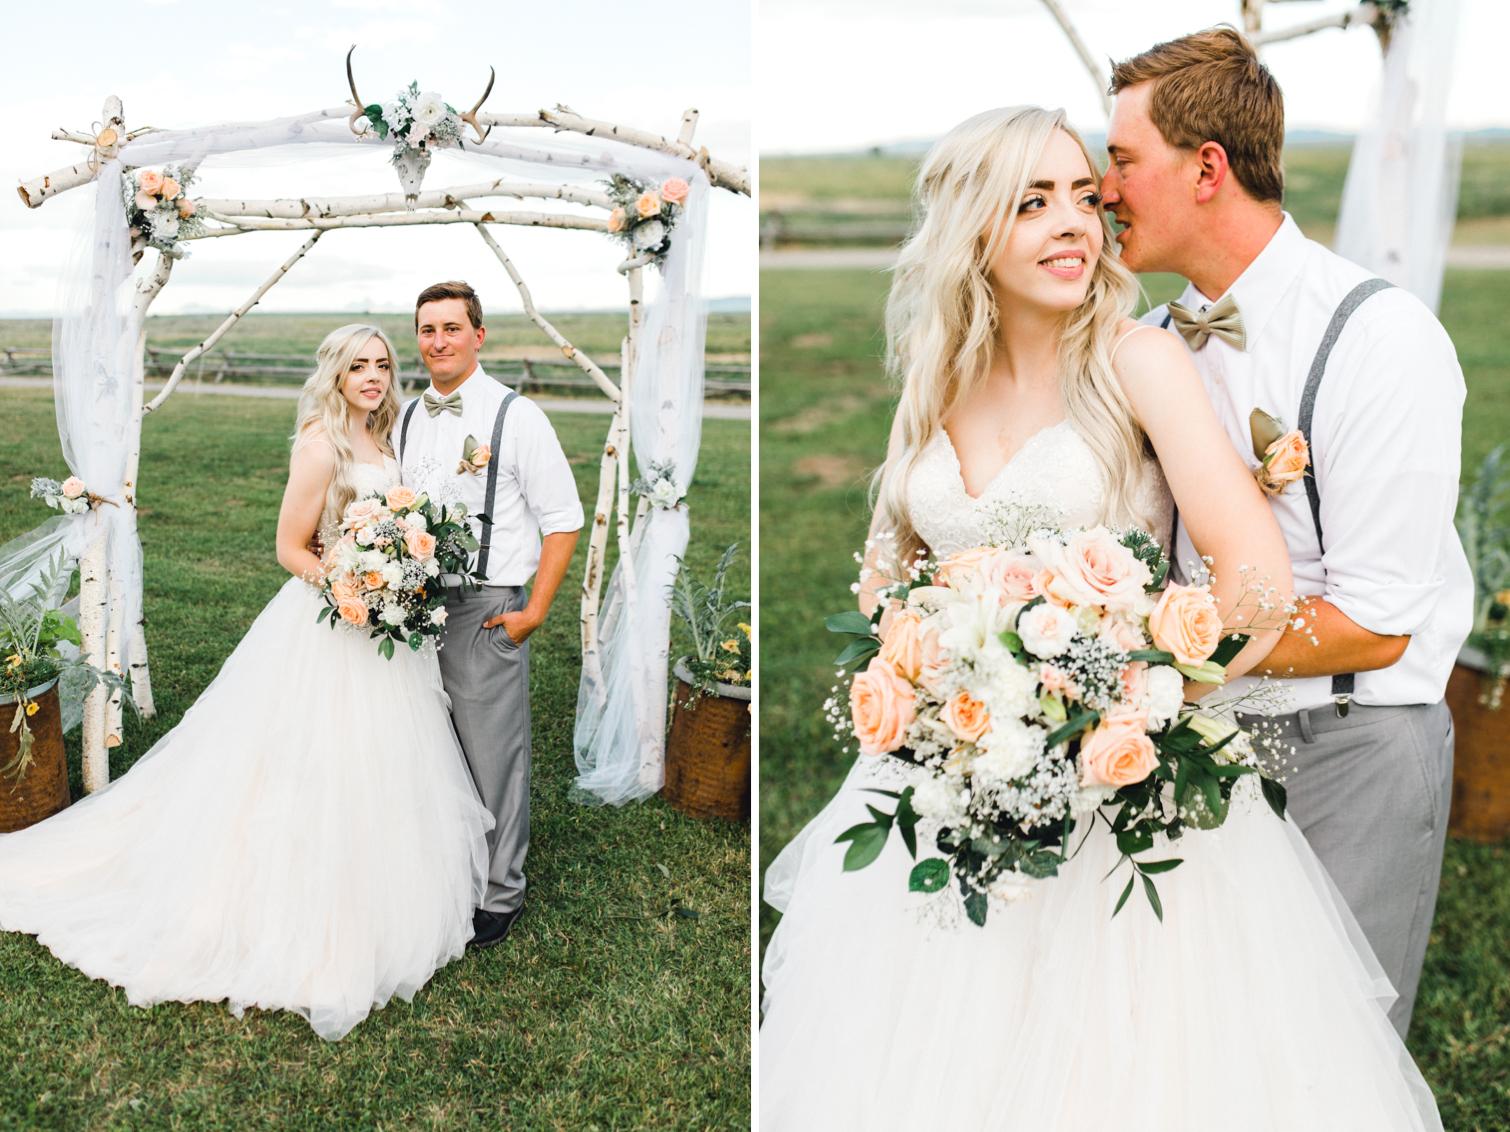 country-outdoor-rustic-wedding-tetons-idaho-anna-christine-photo-6.jpg